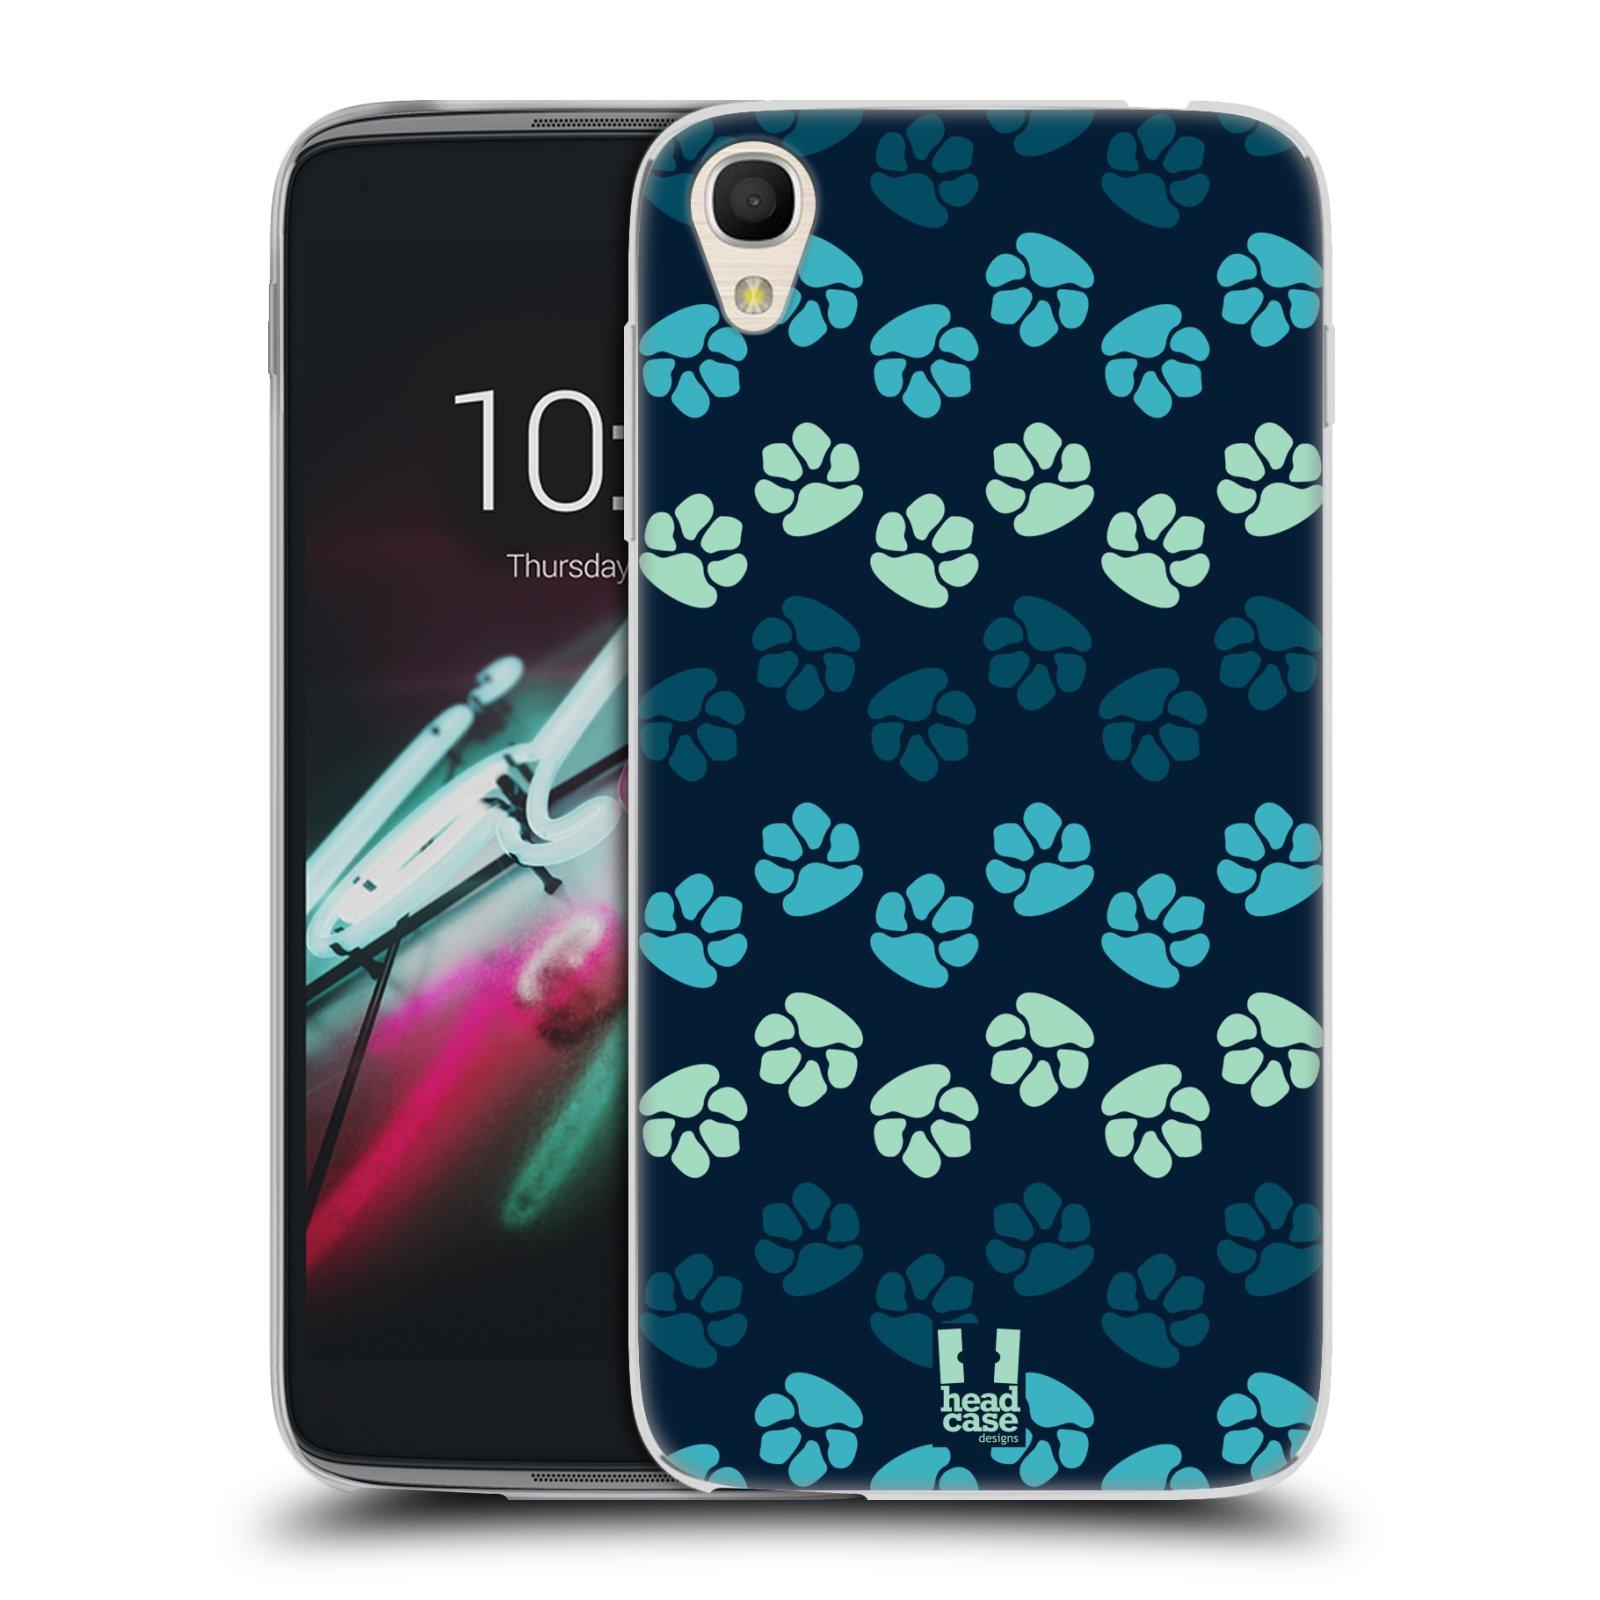 "Silikonové pouzdro na mobil Alcatel One Touch 6039Y Idol 3 HEAD CASE TLAPKY MODRÉ (Silikonový kryt či obal na mobilní telefon Alcatel One Touch Idol 3 OT-6039Y s 4,7"" displejem)"